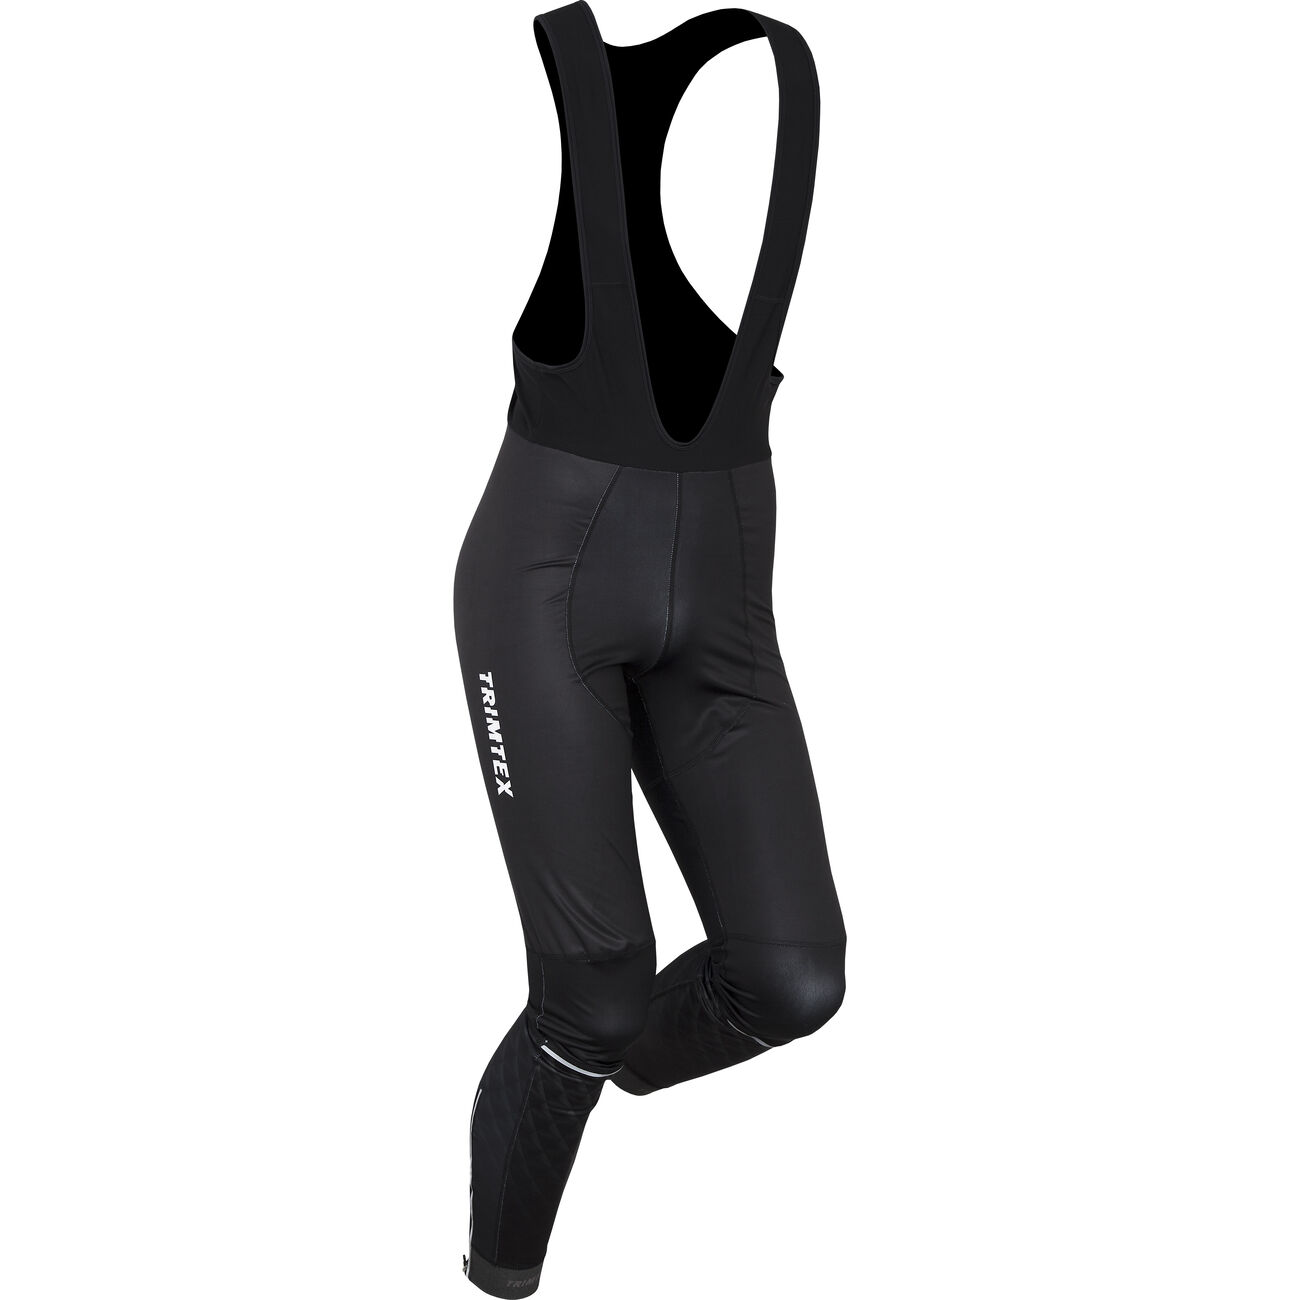 Elite Thermo Bike Pants